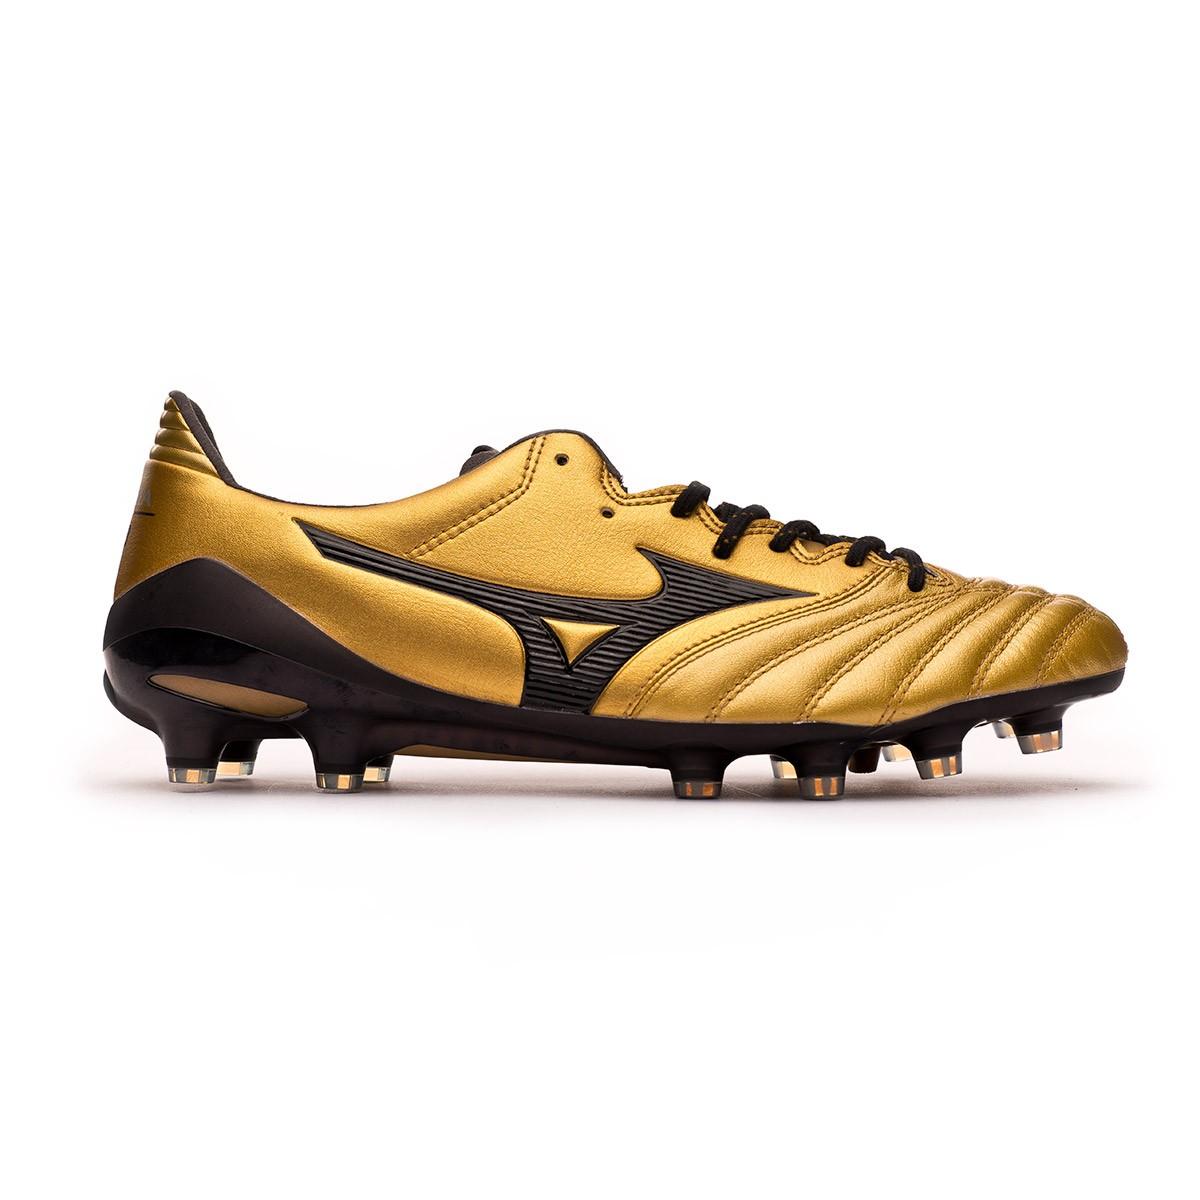 promo code b2e5a 099ac Football Boots Mizuno Morelia NEO II MD Gold-Black - Football store Fútbol  Emotion